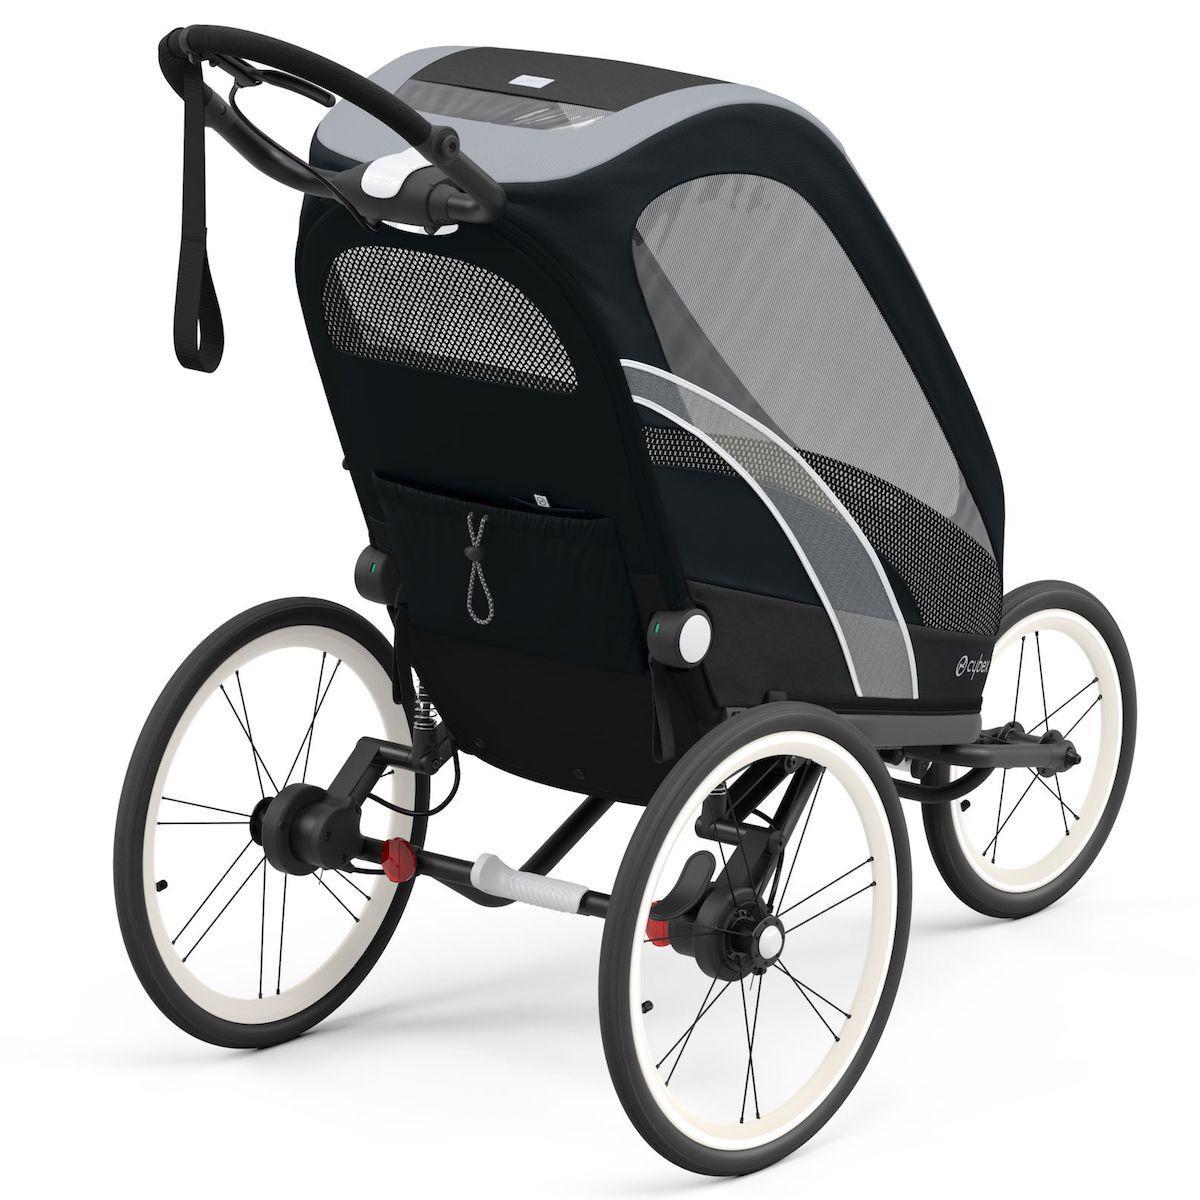 ZENO carrito SPORT GOODS Cybex negro-All Black